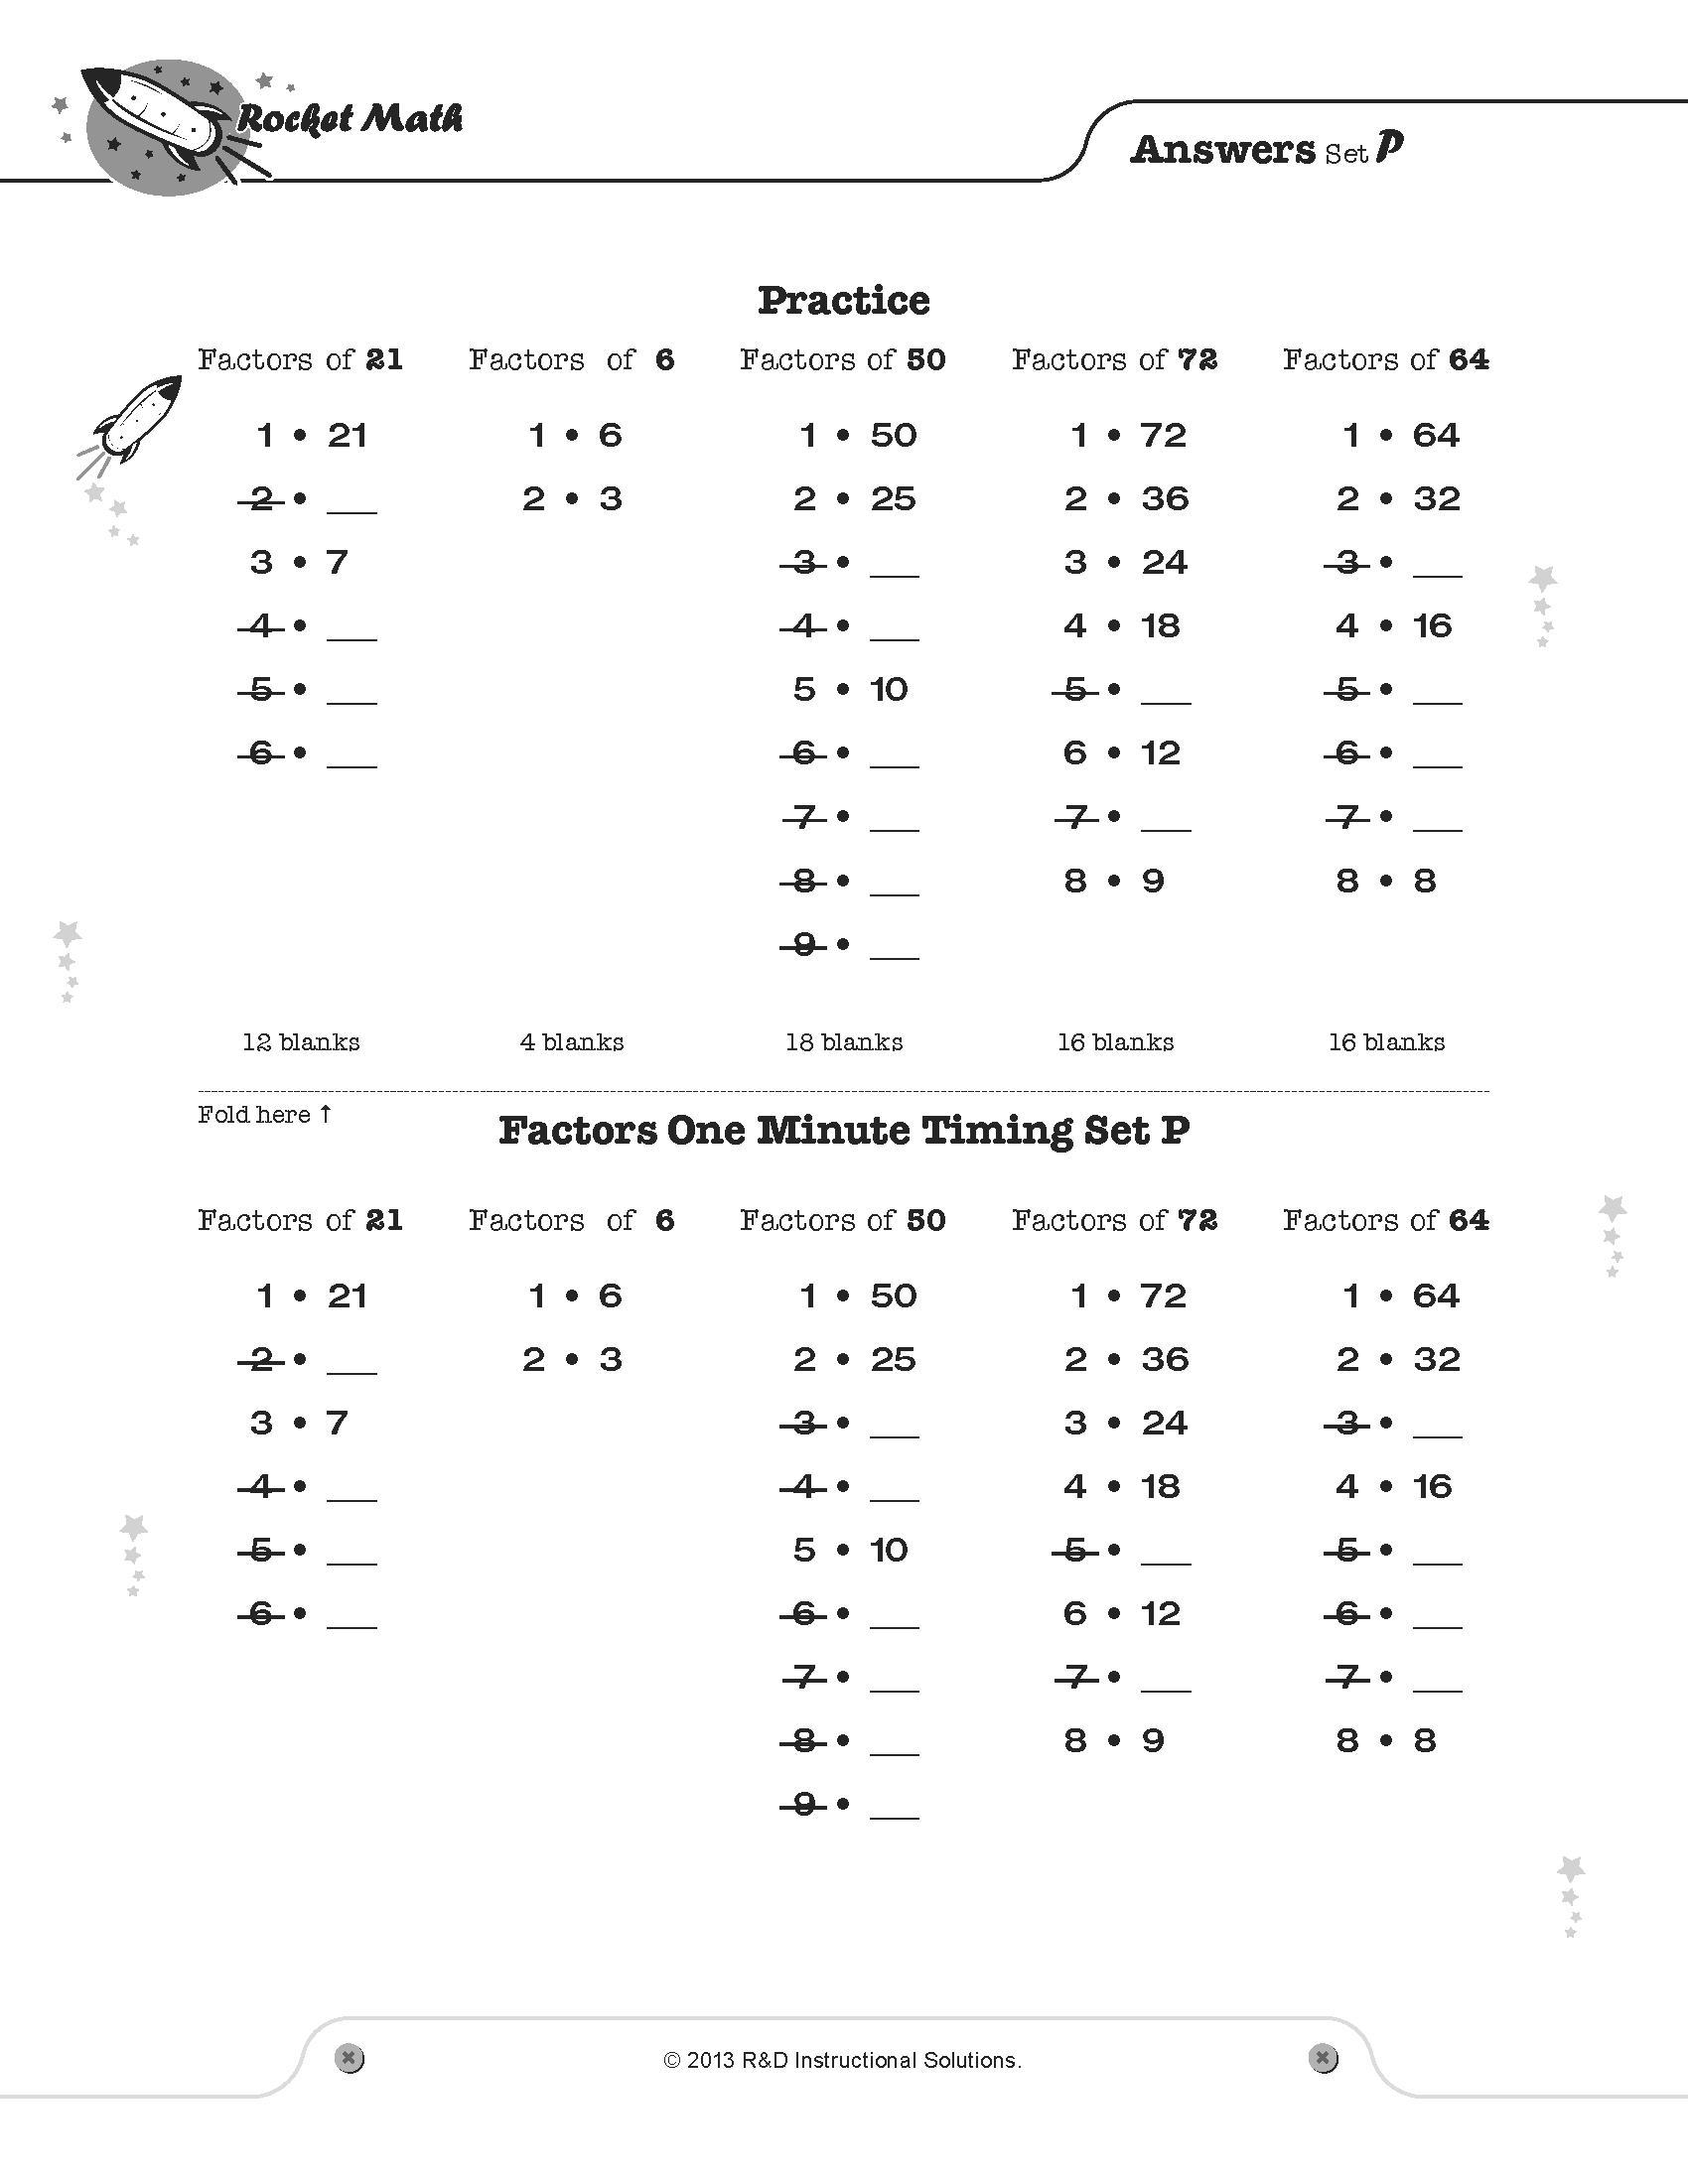 Rocket Math Addition Worksheets math worksheets multiplication and – Rocket Math Addition Worksheets